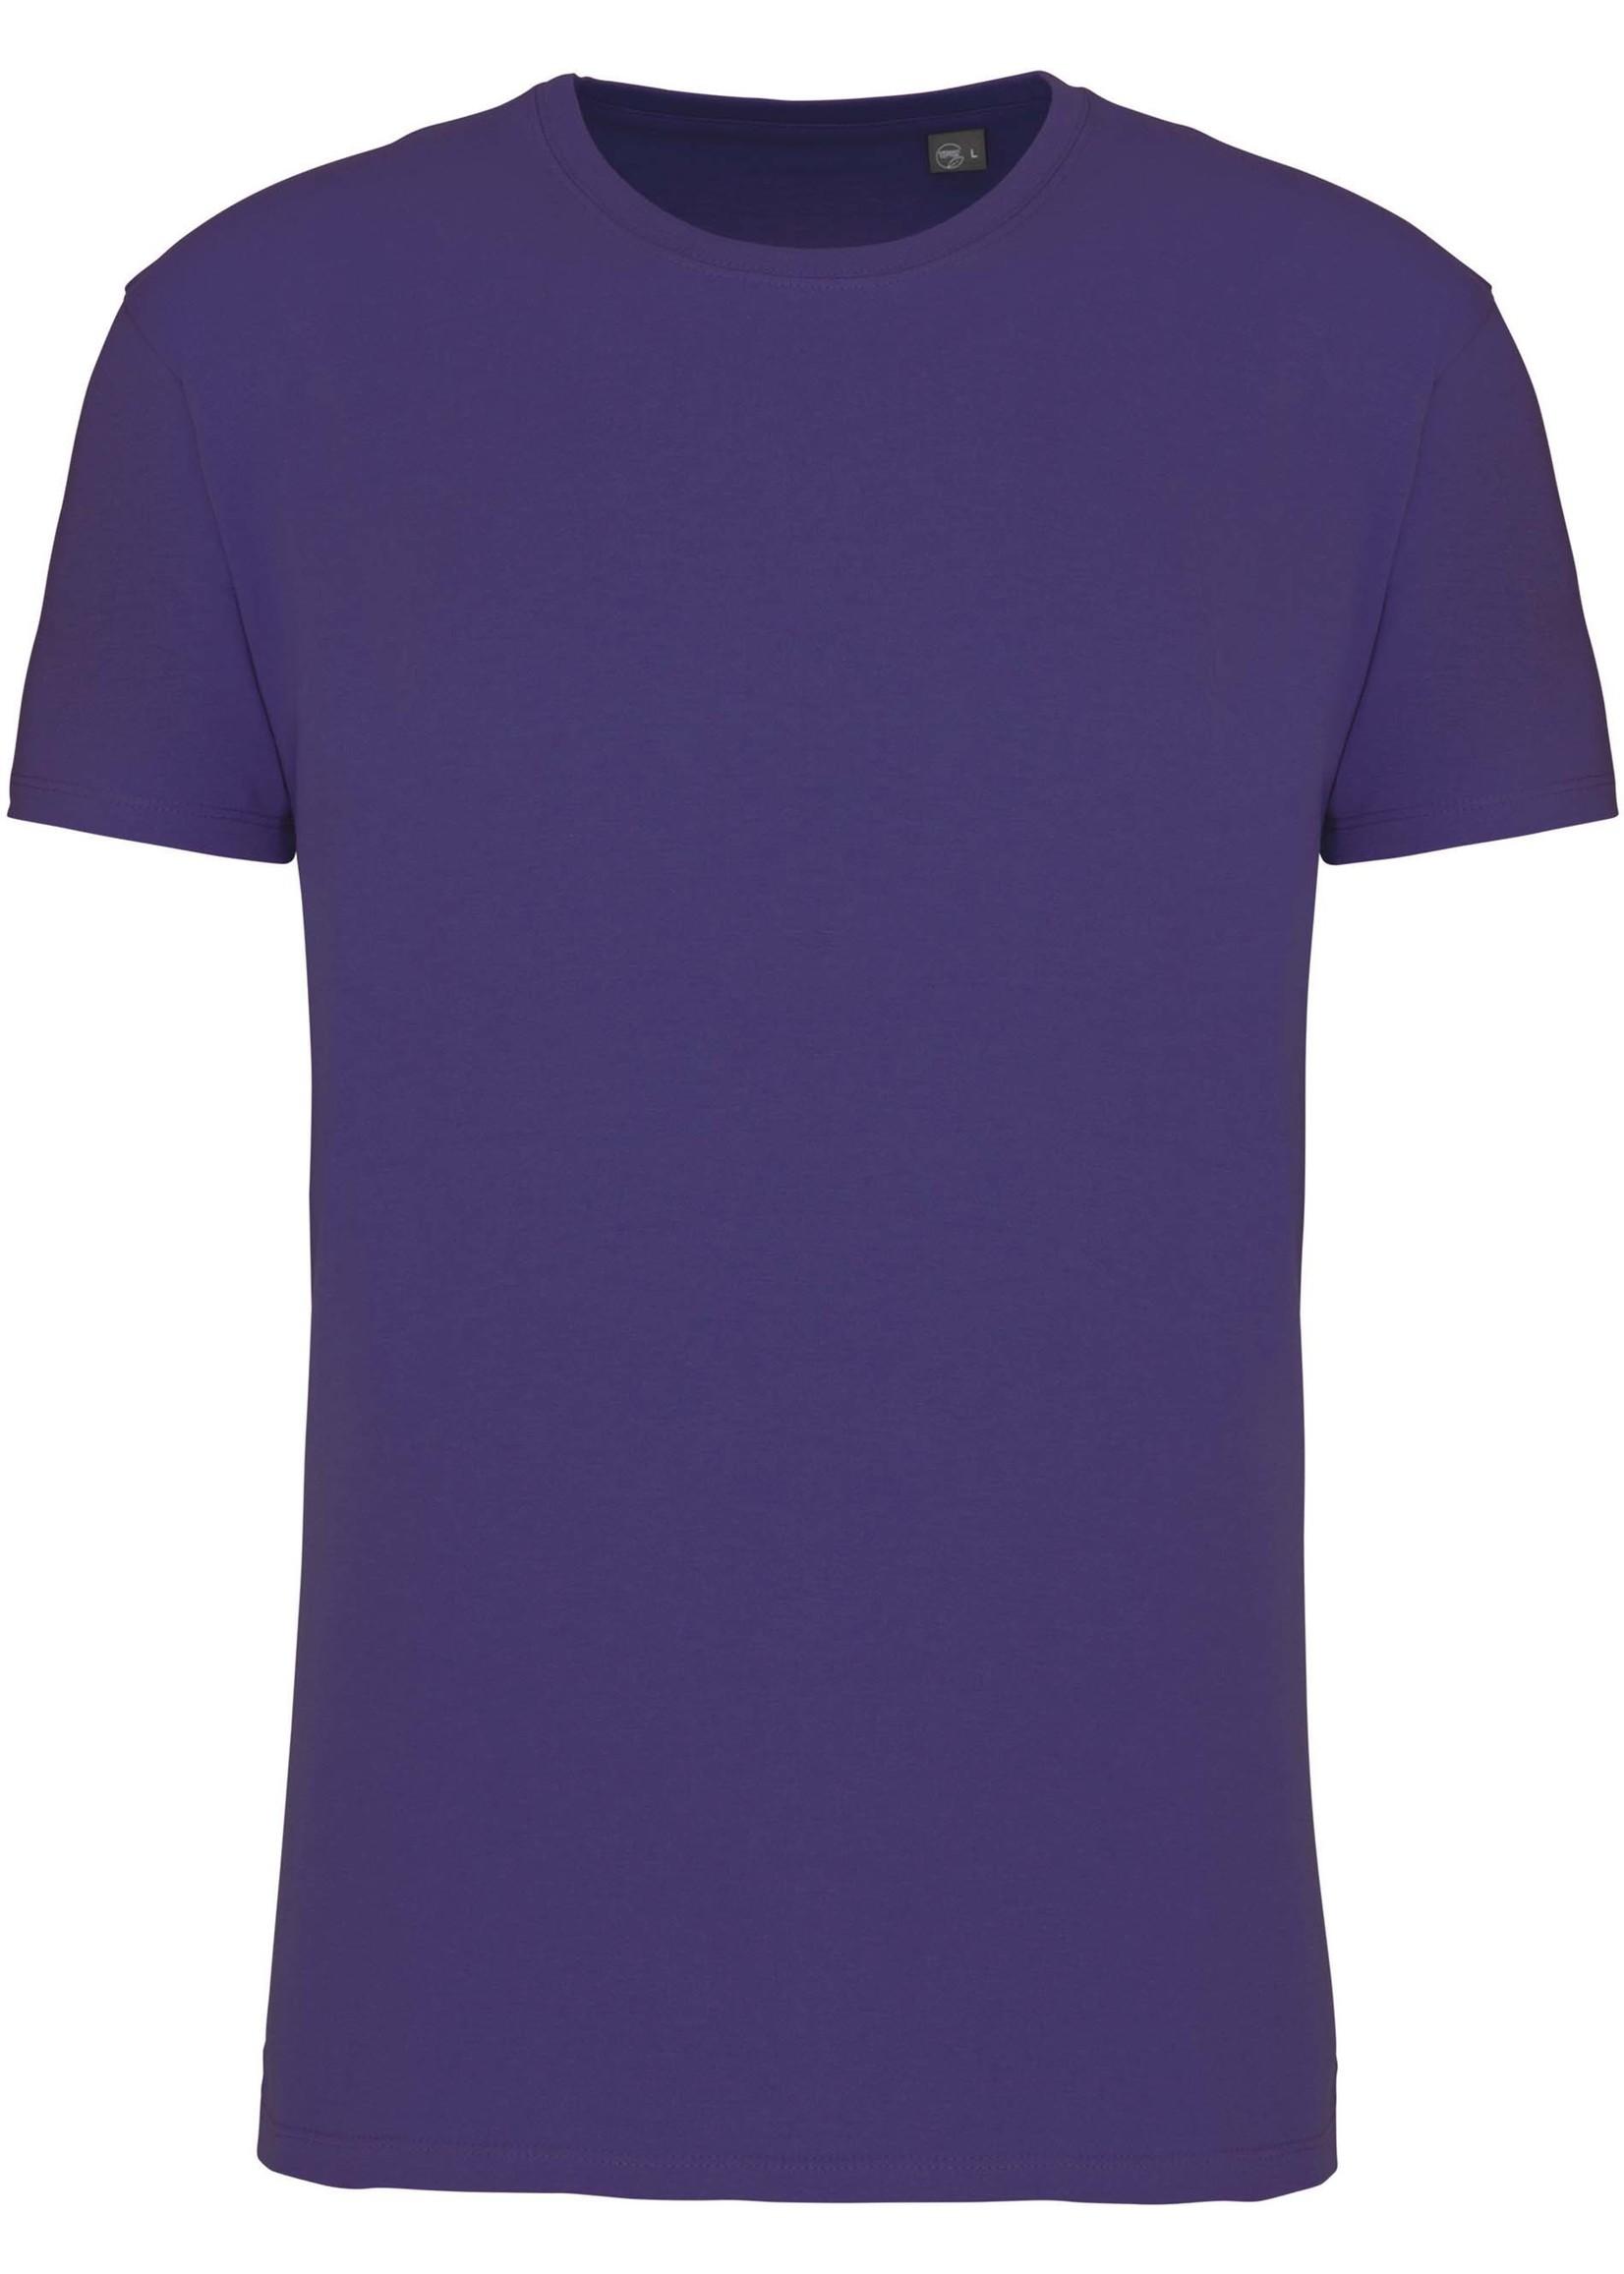 Eco-Friendly Unisex T-shirt -Deep-Purple